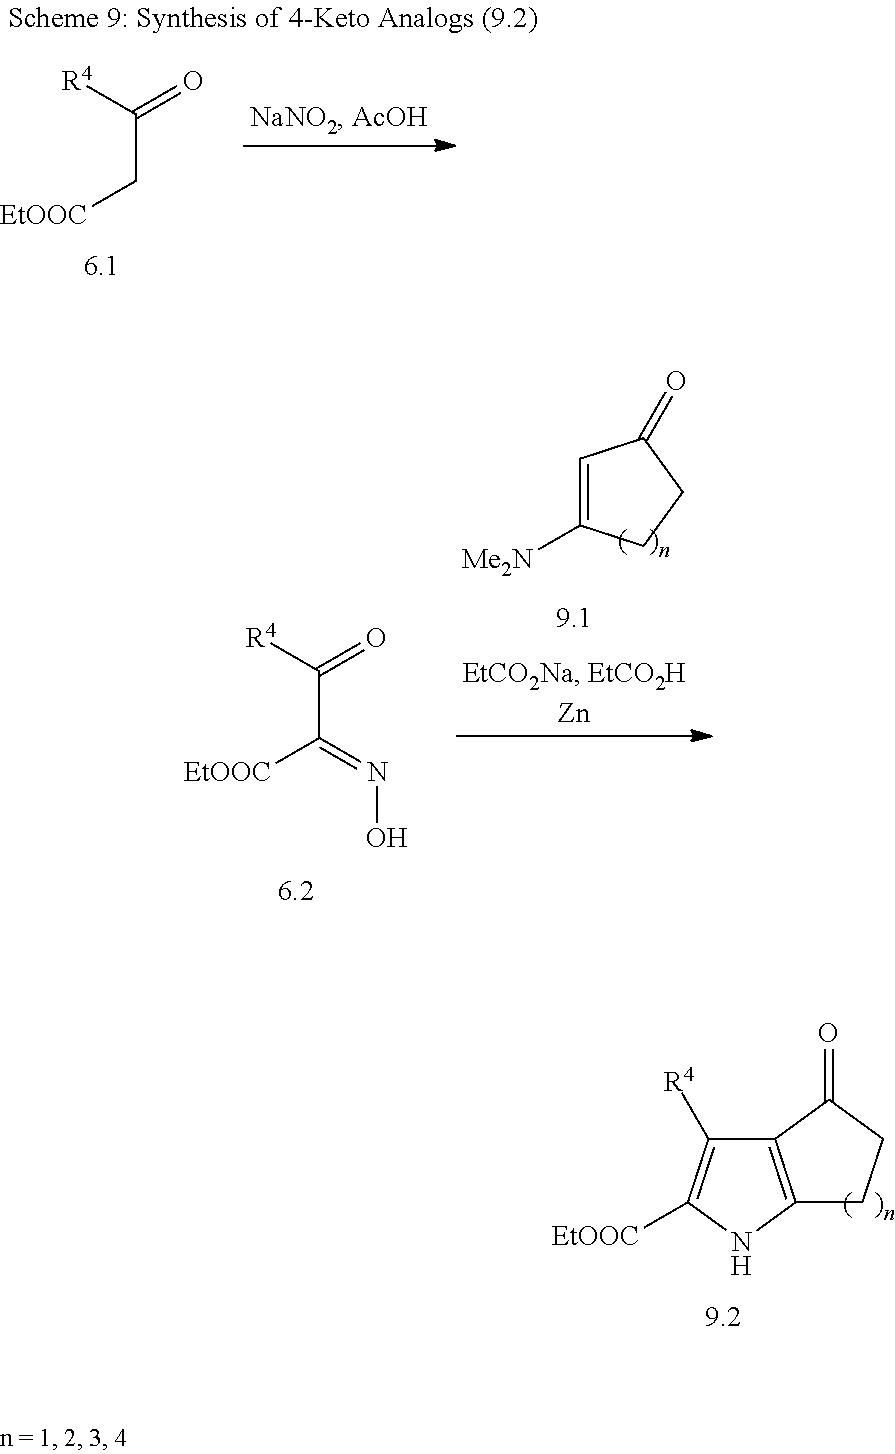 us7902252b2 inhibitors of d amino acid oxidase patents Starter Switch Wiring Diagram figure us07902252 20110308 c00073